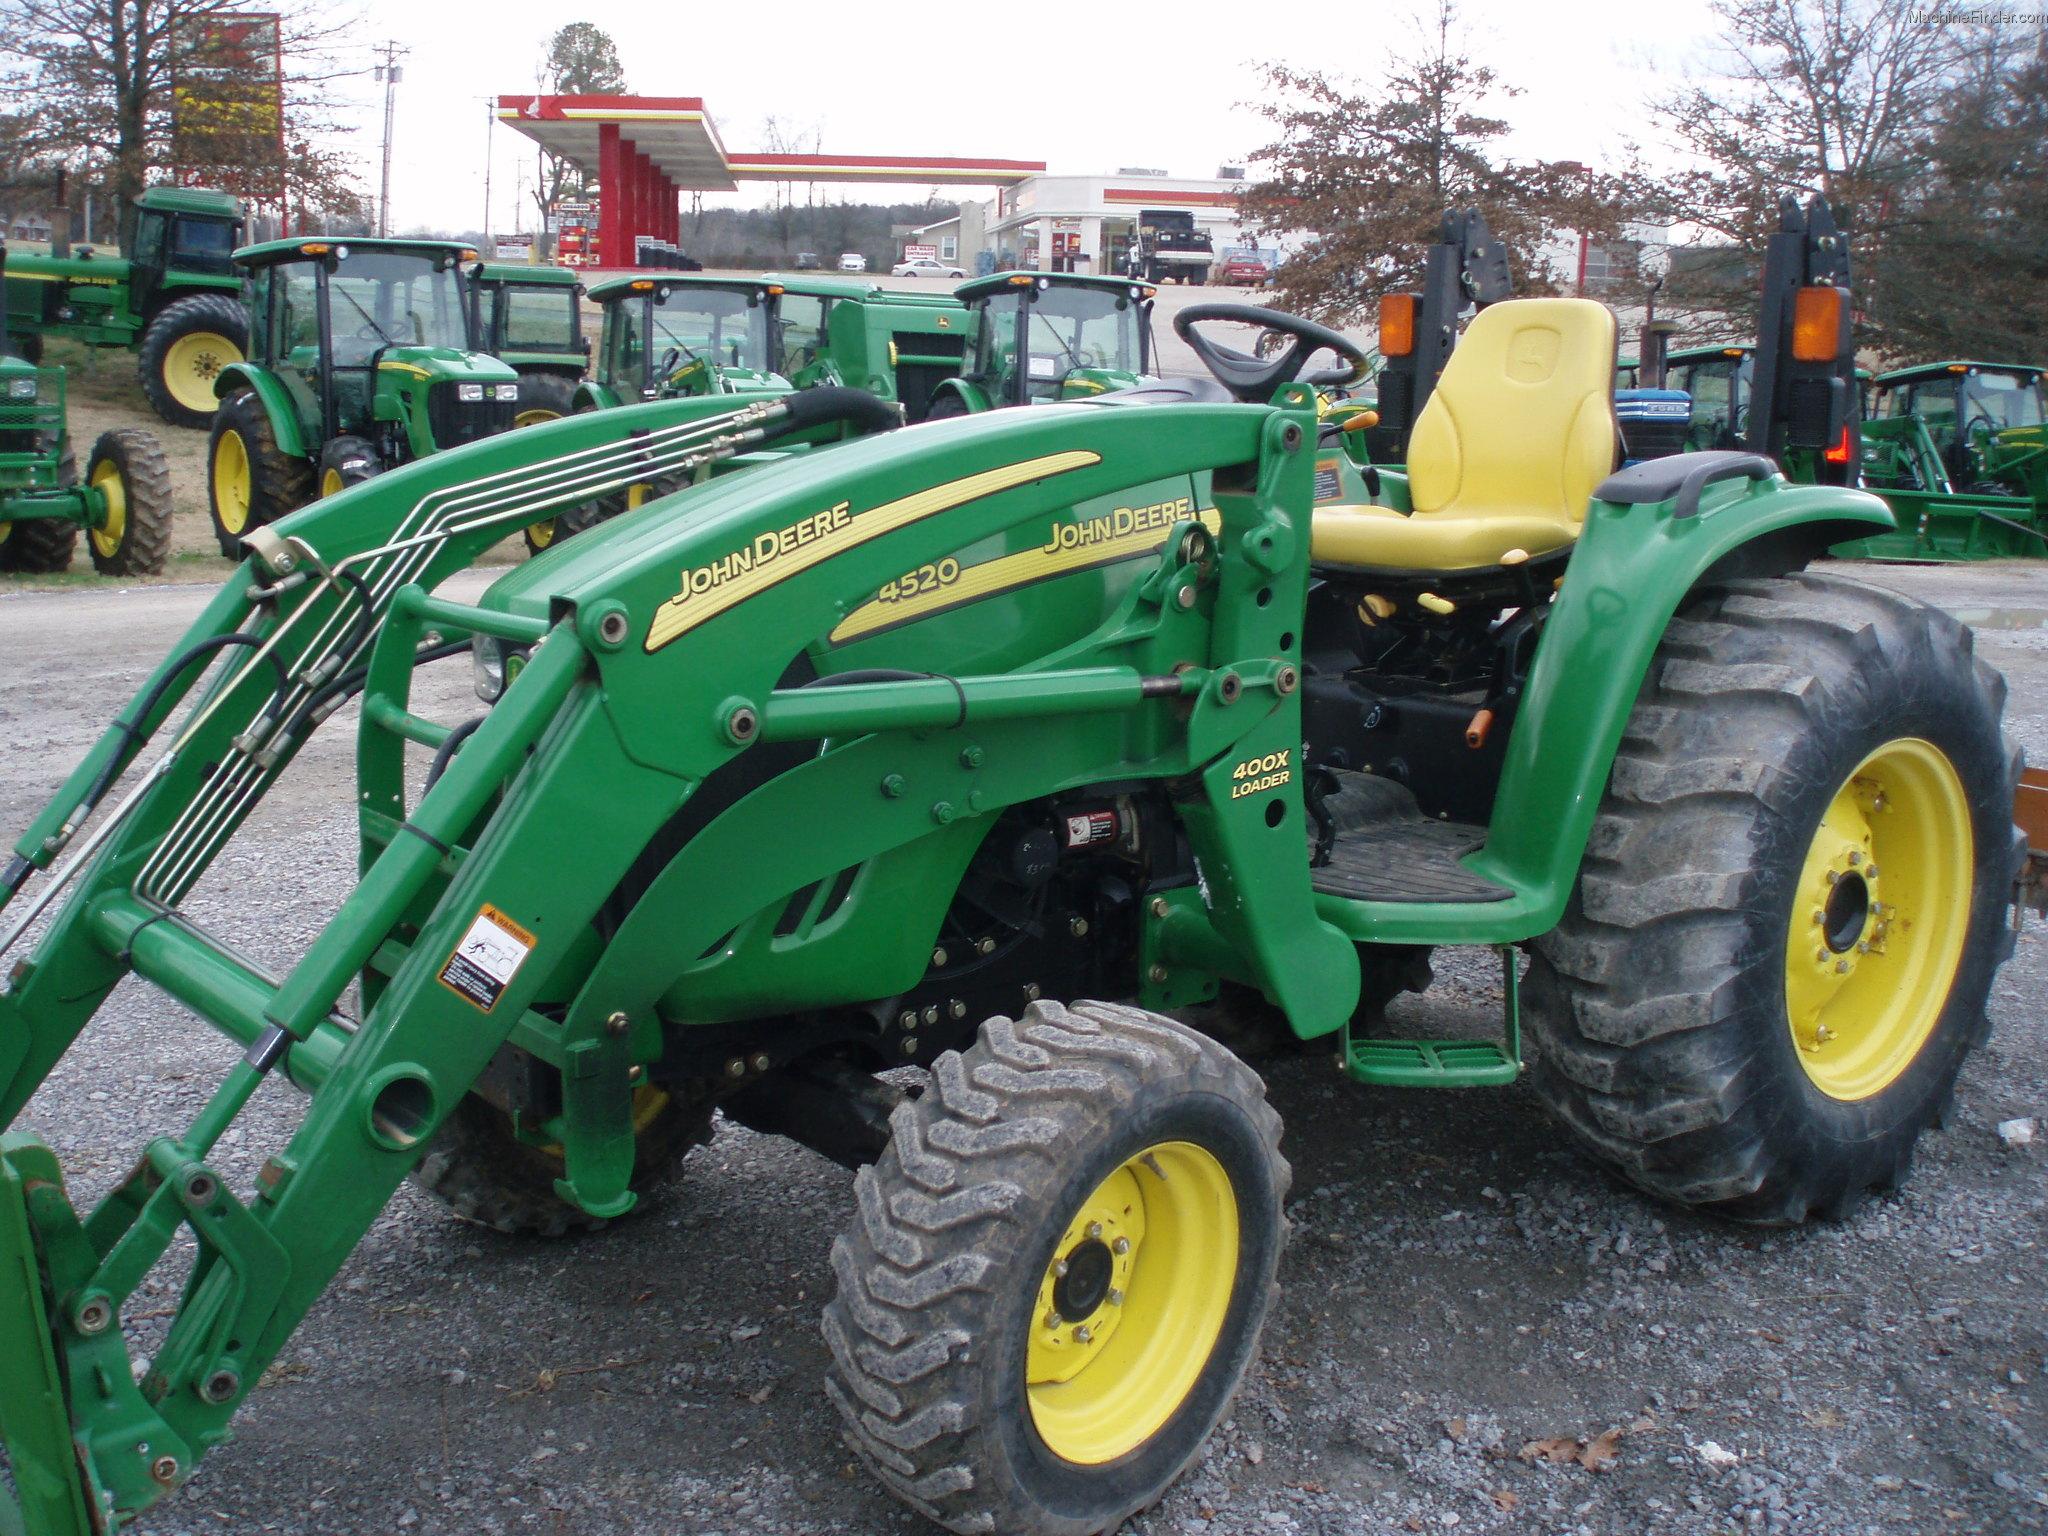 2005 John Deere 4520 Tractors - Compact (1-40hp.) - John ...